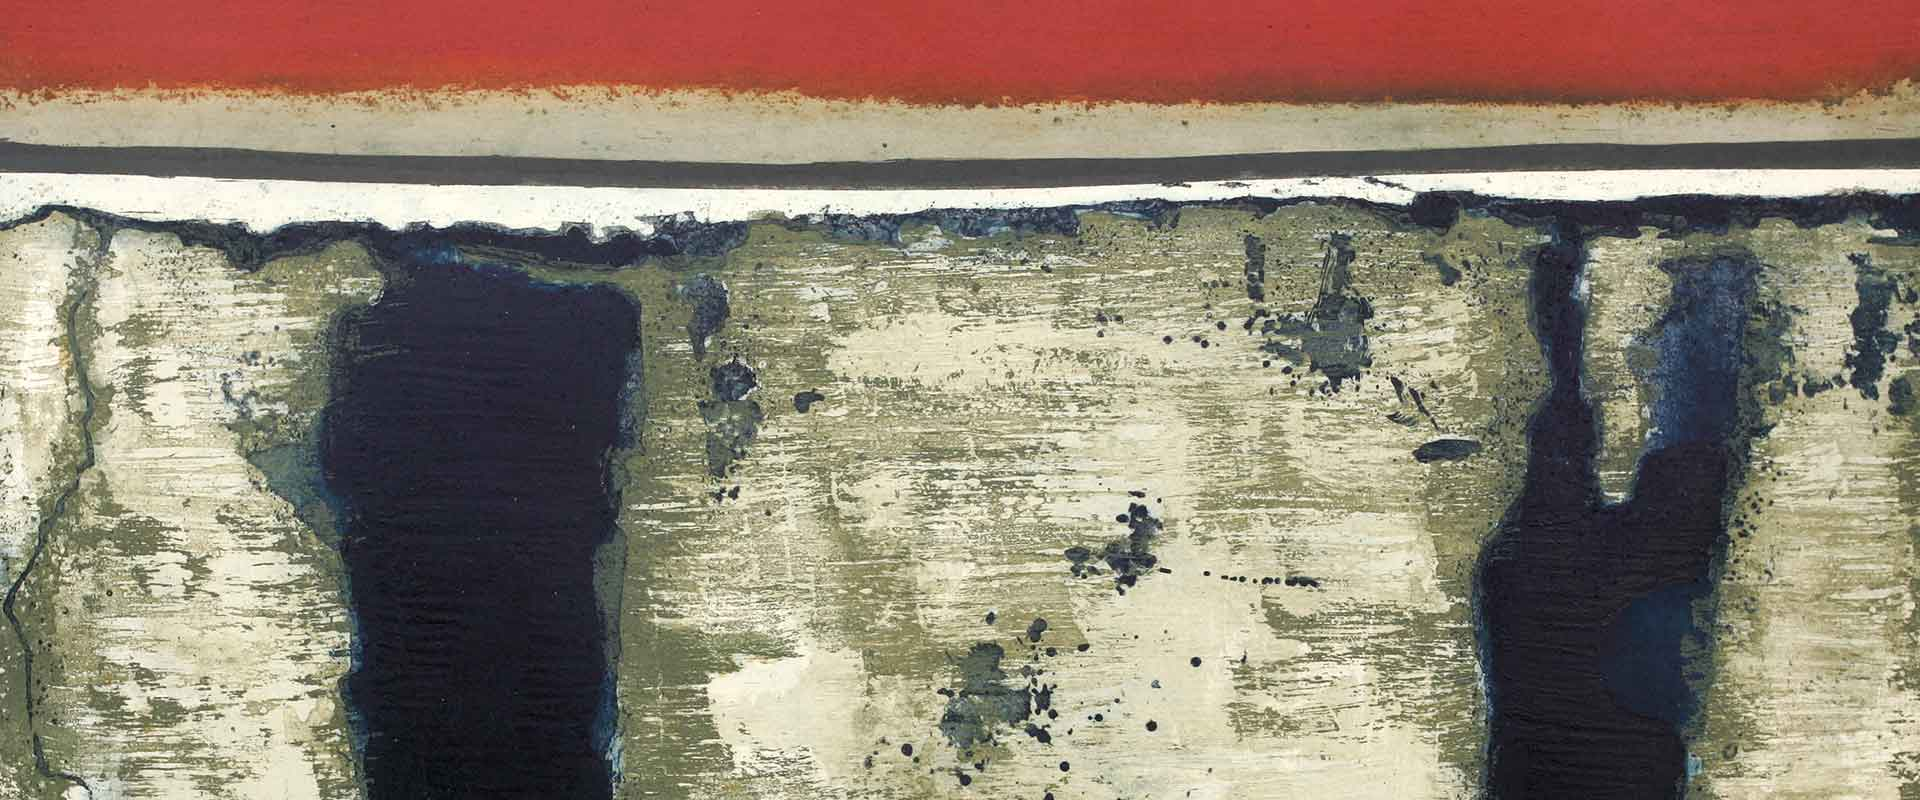 Detail of Delta fine art print by Stephen Vaughan